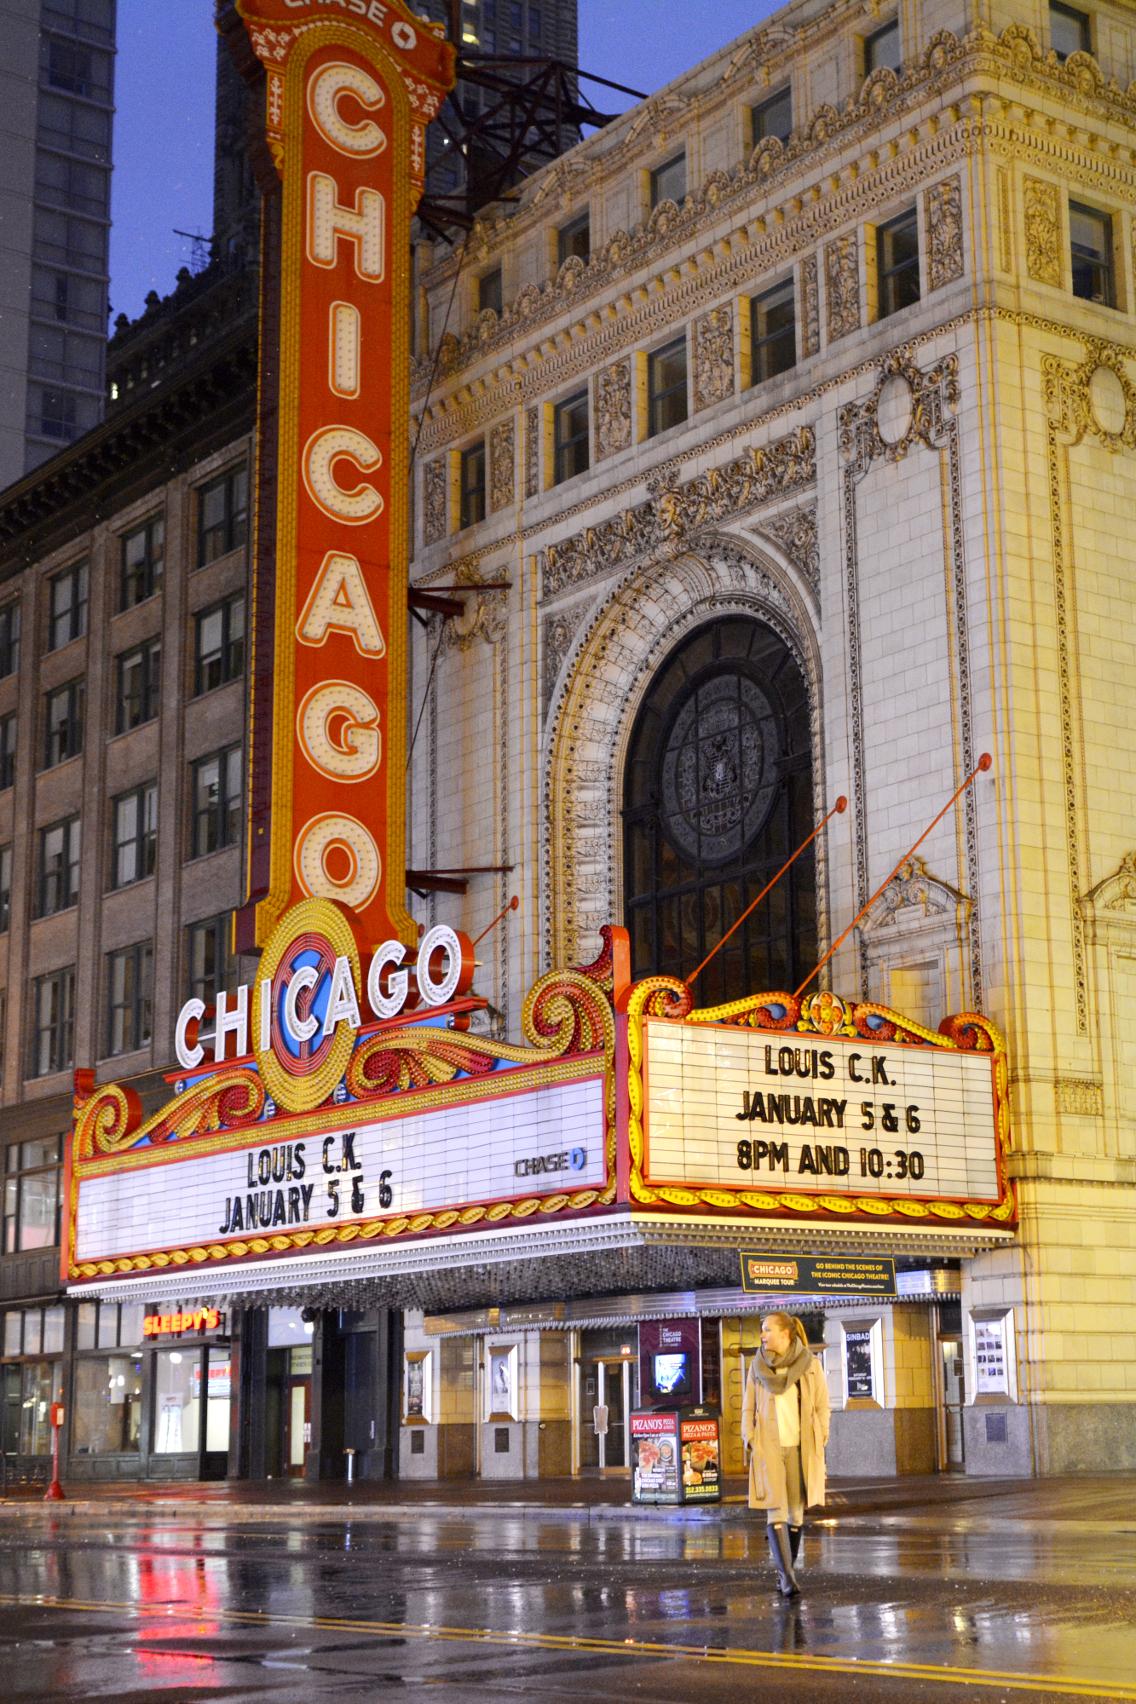 Chicago Theatre with Sed Bona 2